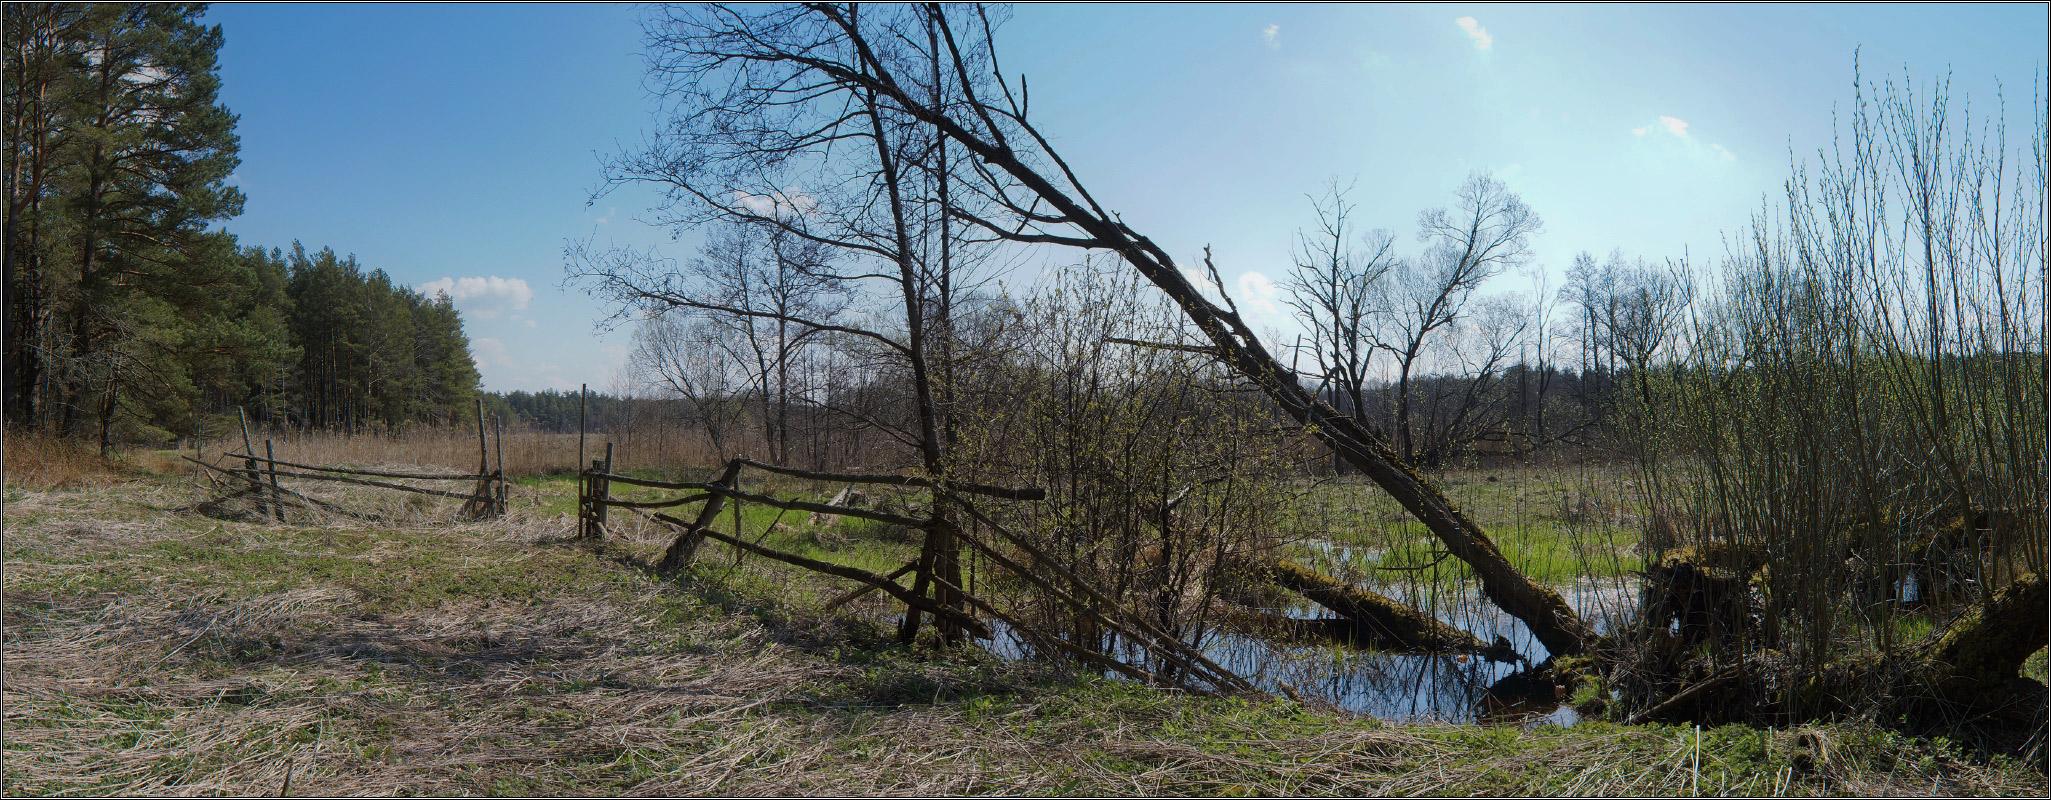 http://i1.imageban.ru/out/2012/04/25/abb25c035434edca59af45c4451021c1.jpg